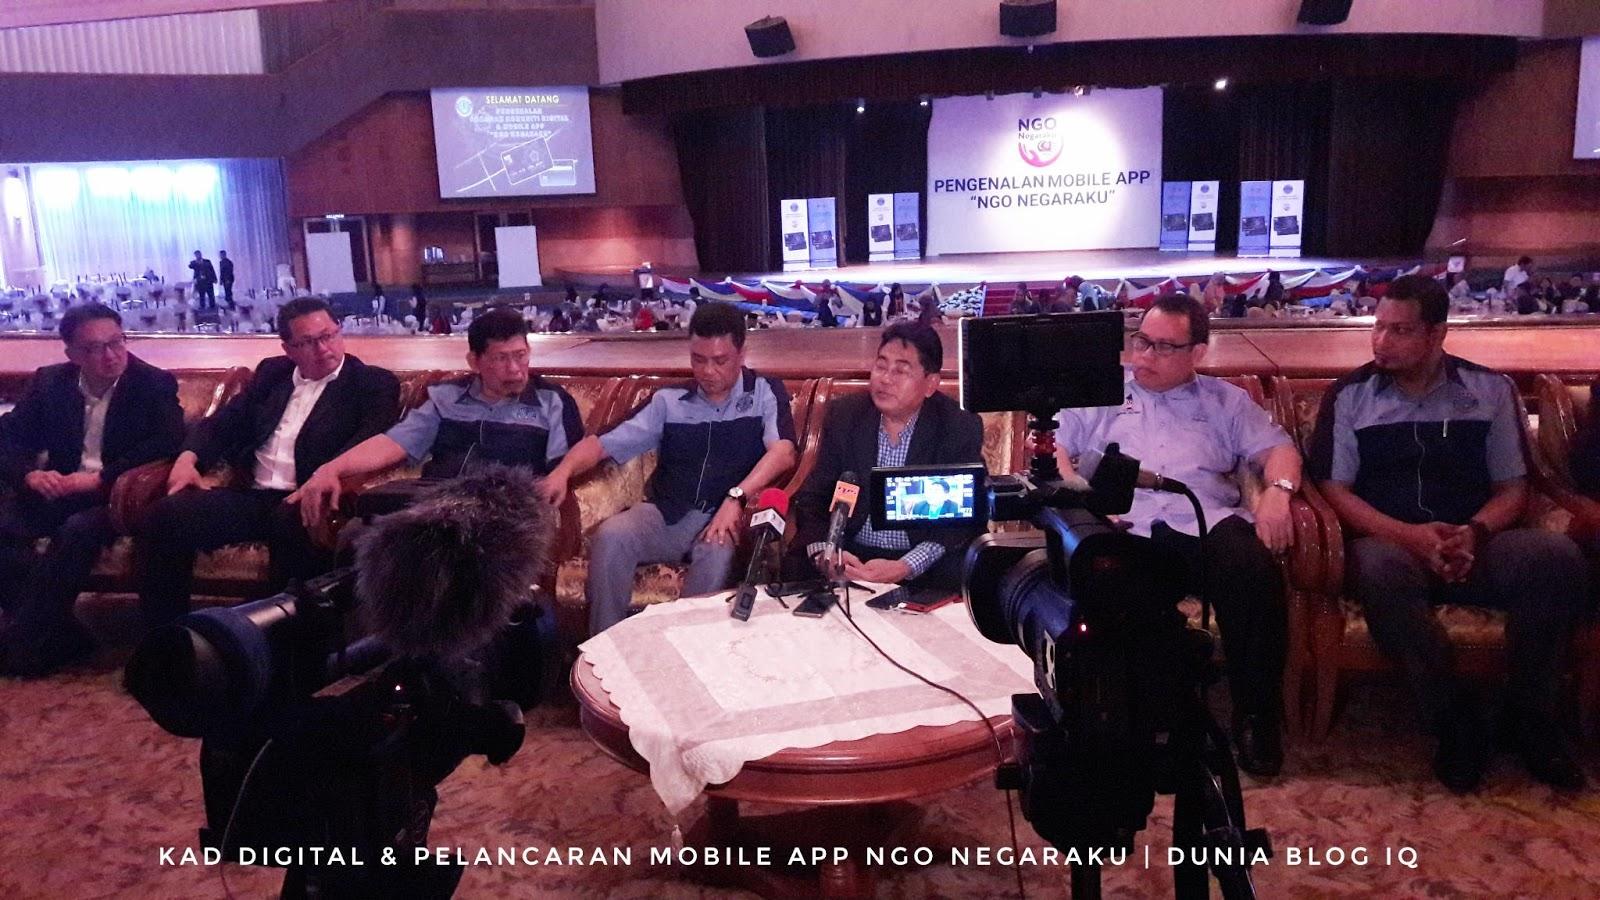 Kad Digital Dan Pelancaran Mobile App NGO Negaraku